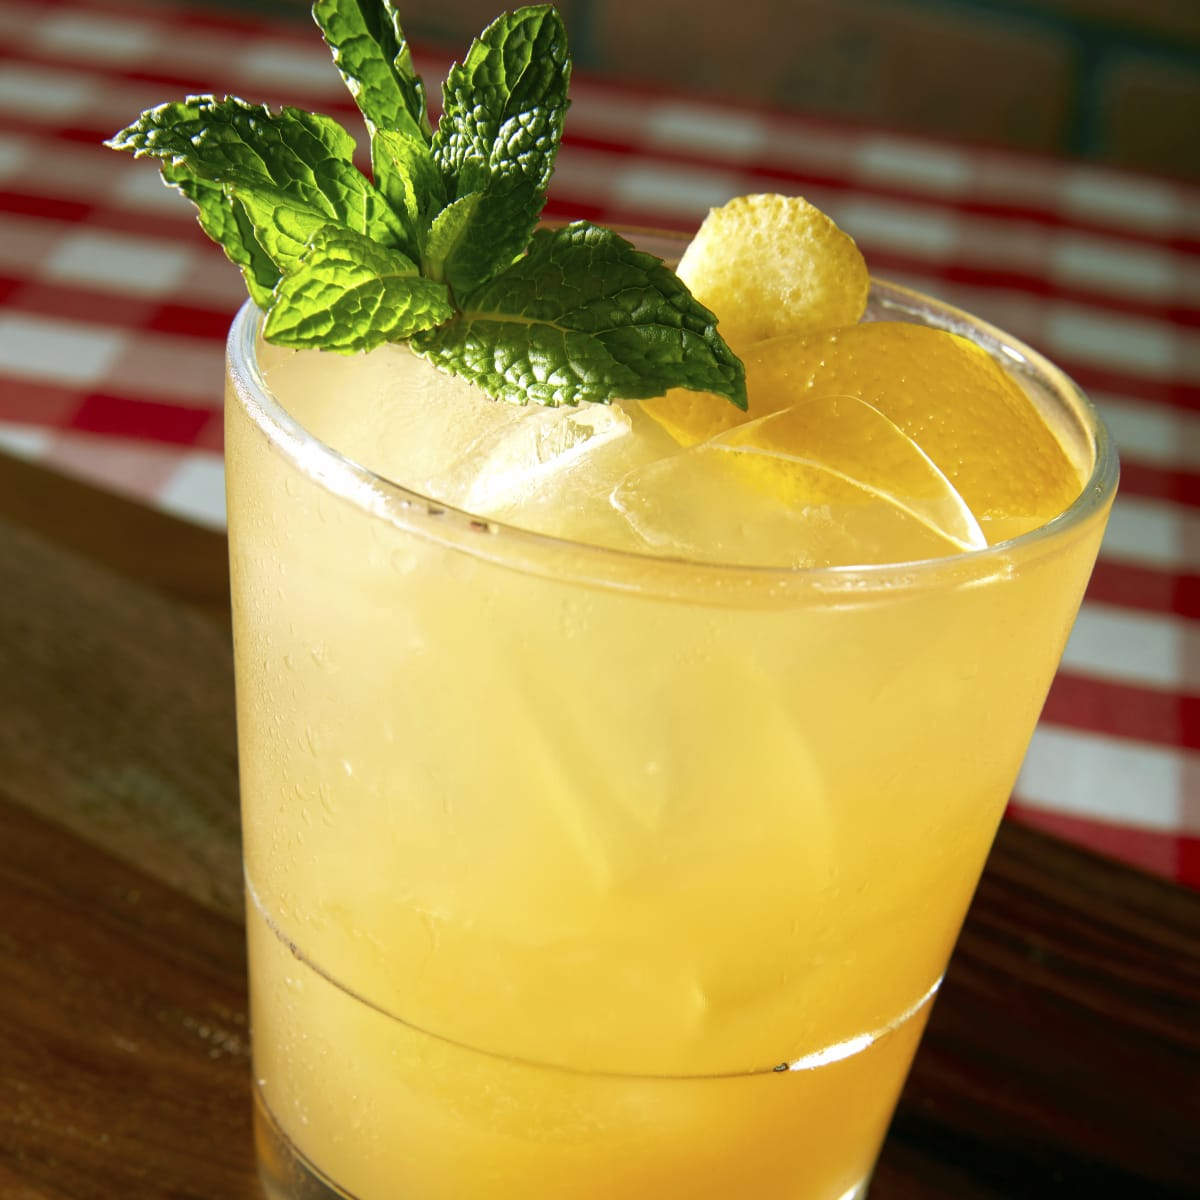 Houston, Grimaldi's Pizzeria, Honey Lemon Smash, August 2017